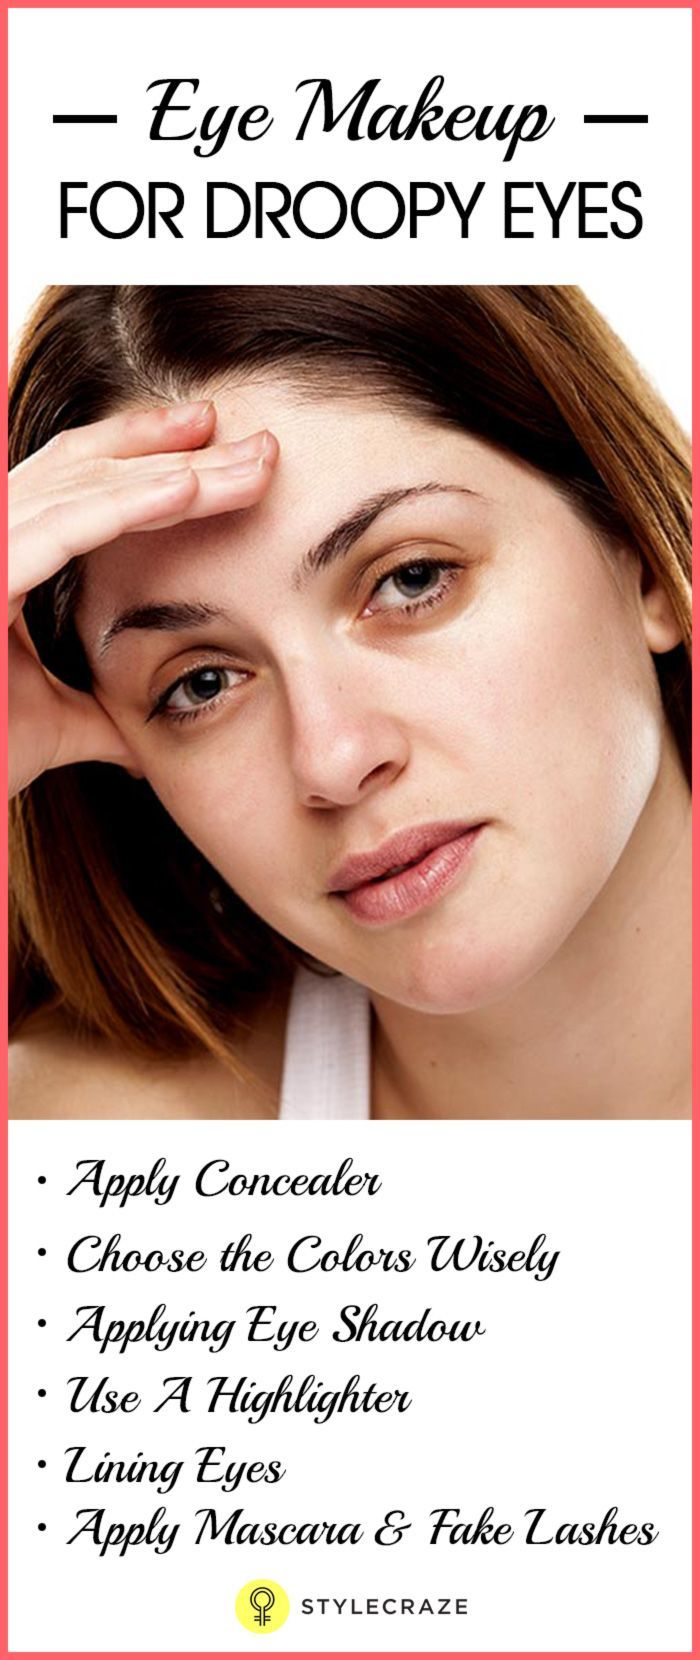 Eye Makeup for Droopy Eyes Droopy eyes, Droopy eye